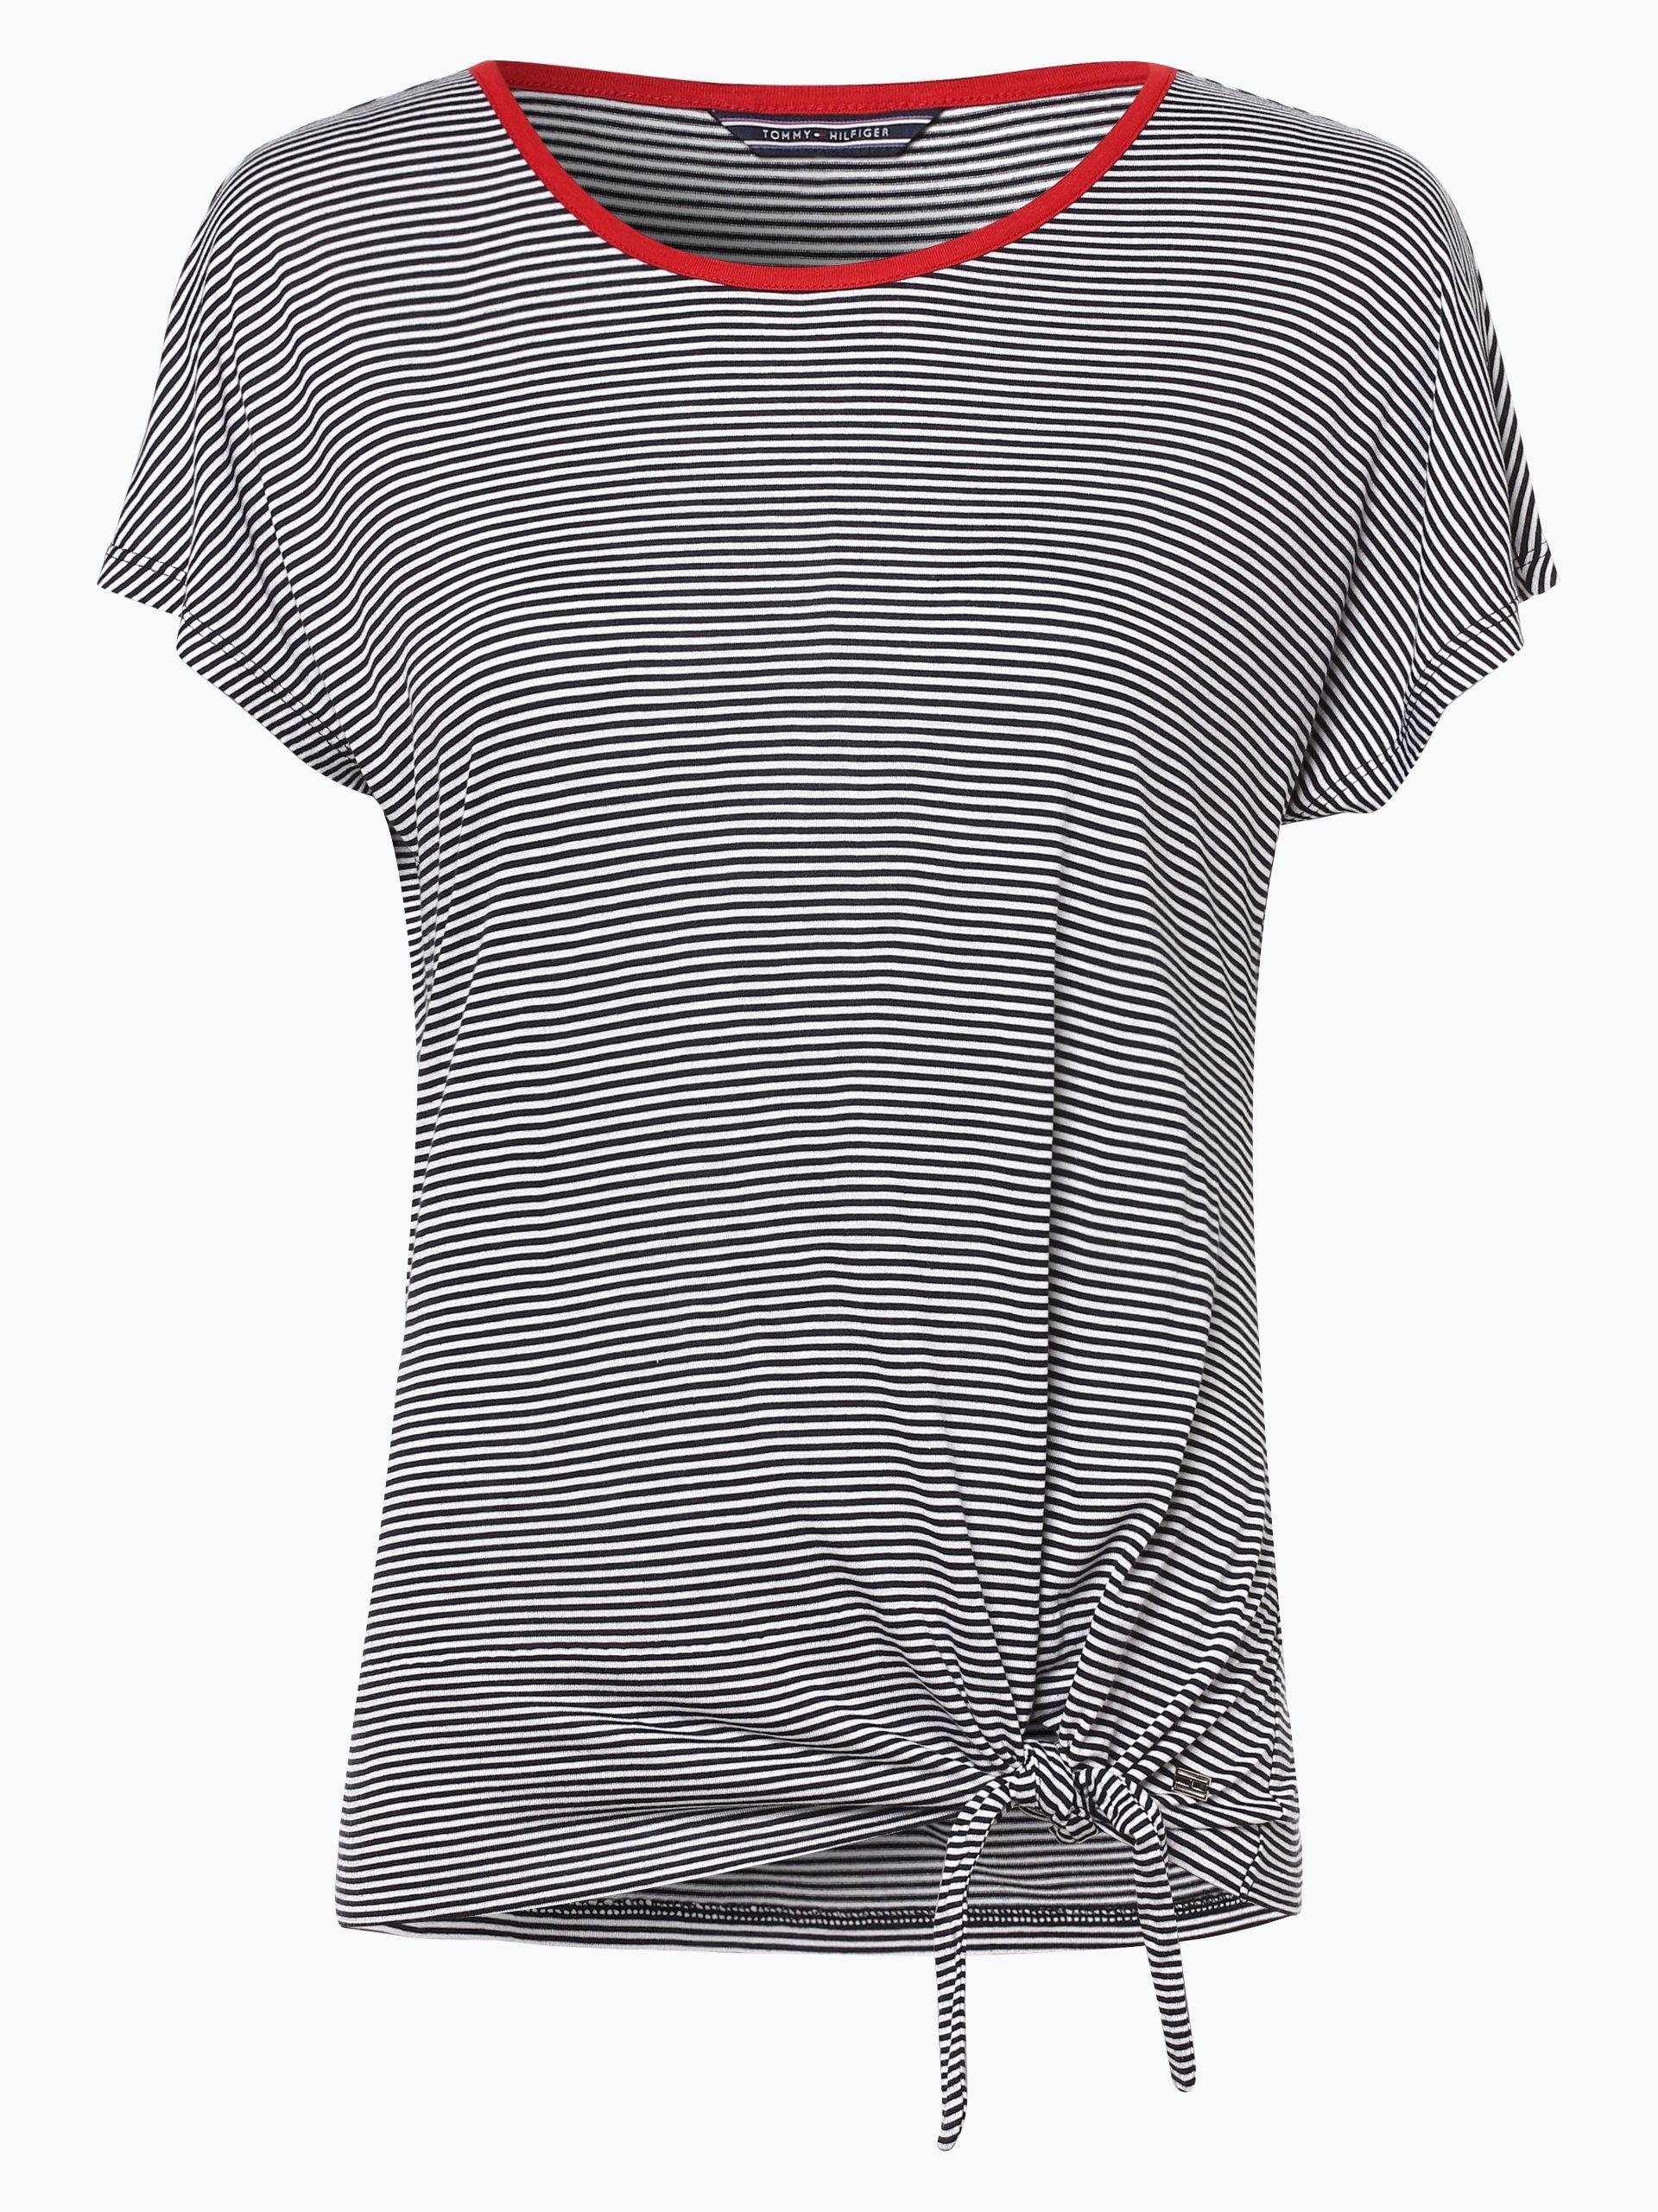 tommy hilfiger damen t shirt ema marine gestreift online. Black Bedroom Furniture Sets. Home Design Ideas